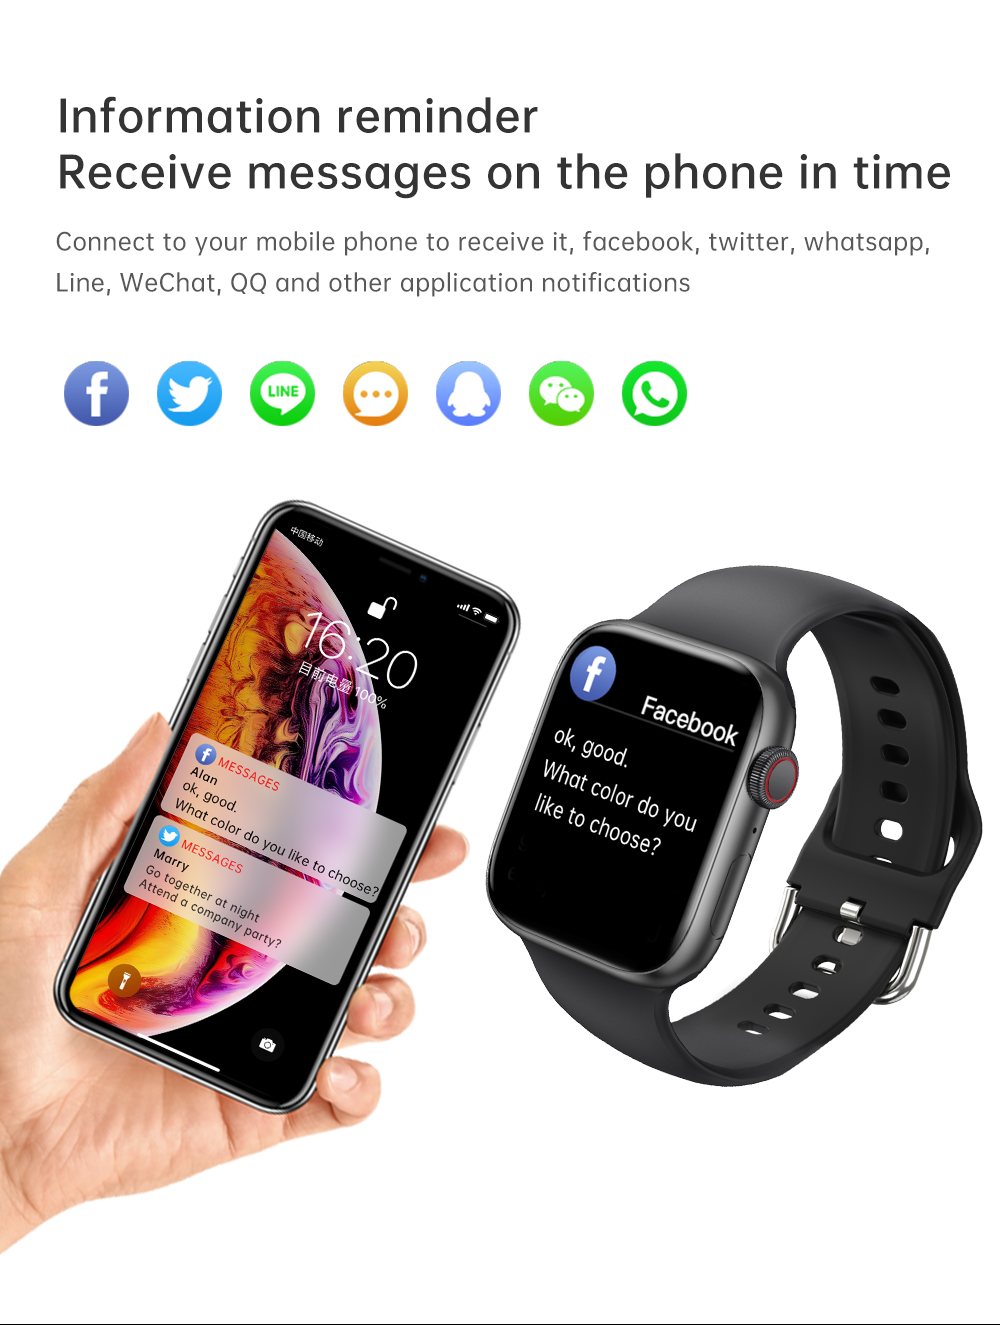 H6281dc40b3304833a529e64b89bcc72fq IWO 13 Pro T800 Smartwatch 2021 1.72 Inch Bluetooth Call DIY Dail Fitness Bracelet Smart Watch Men Women PK IWO W46 W56 Series 6